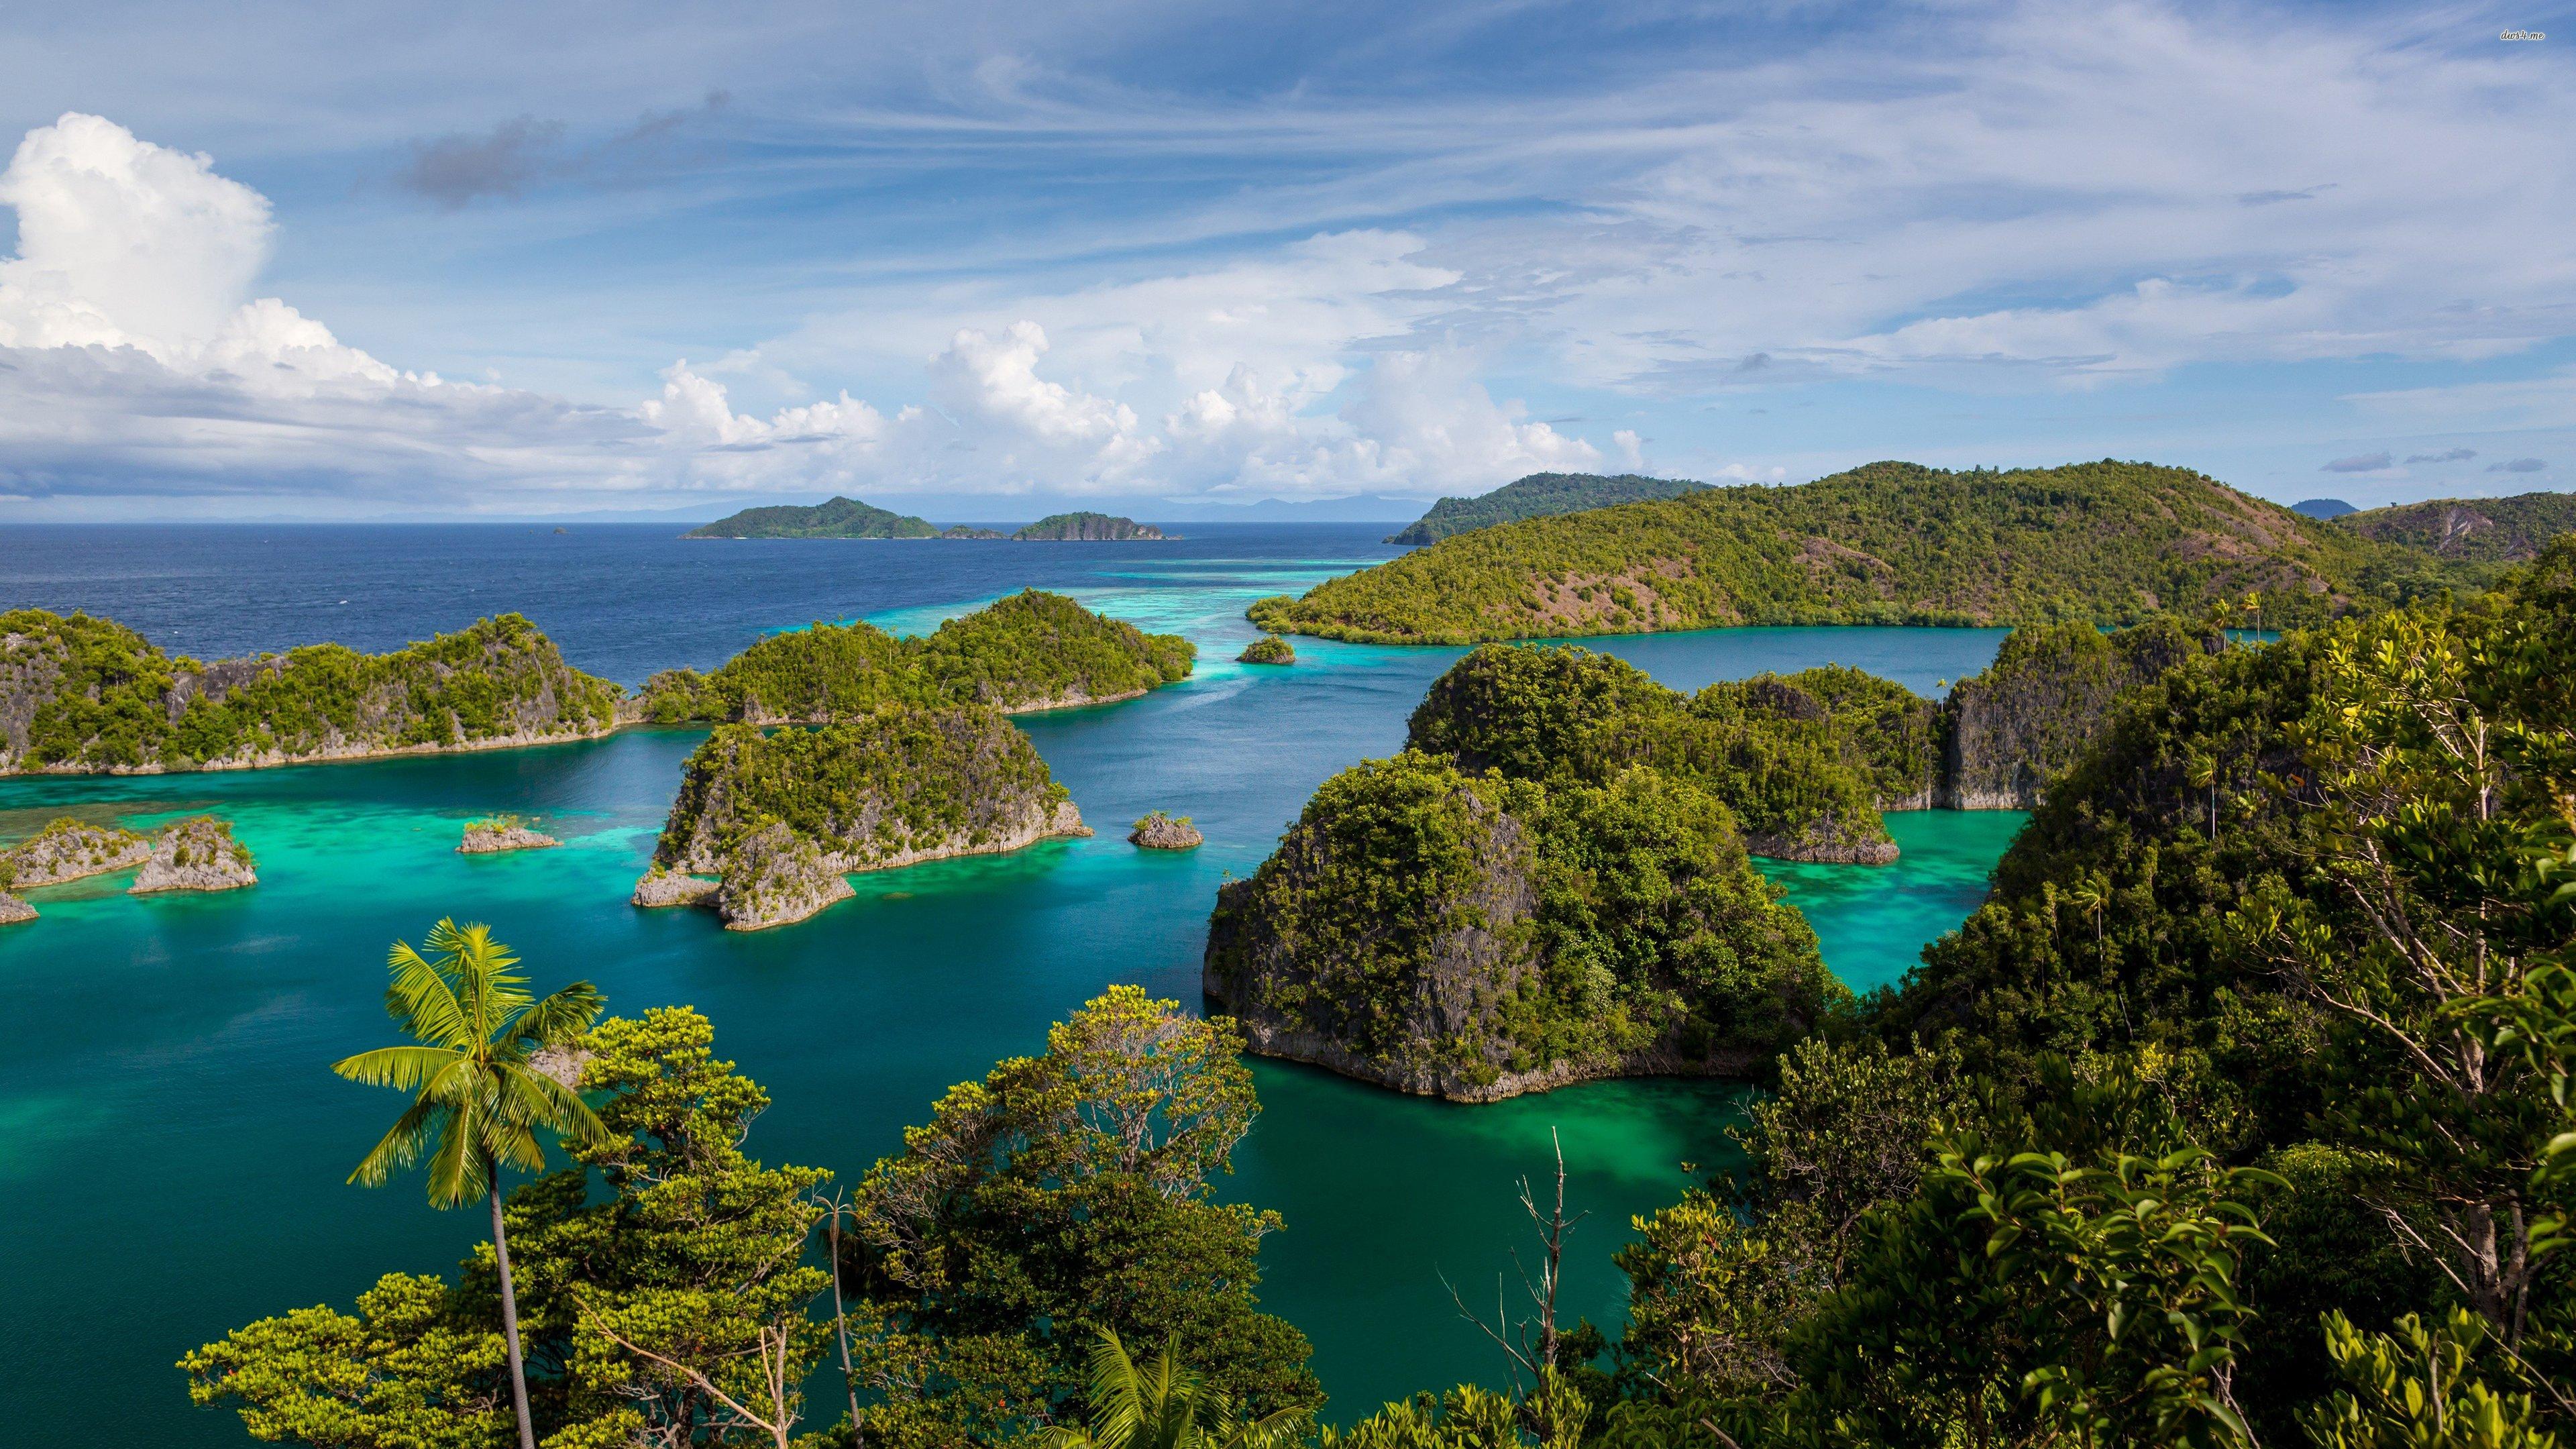 Raja Ampat Indonesia exotic tropics Islands ocean palm 3840x2160